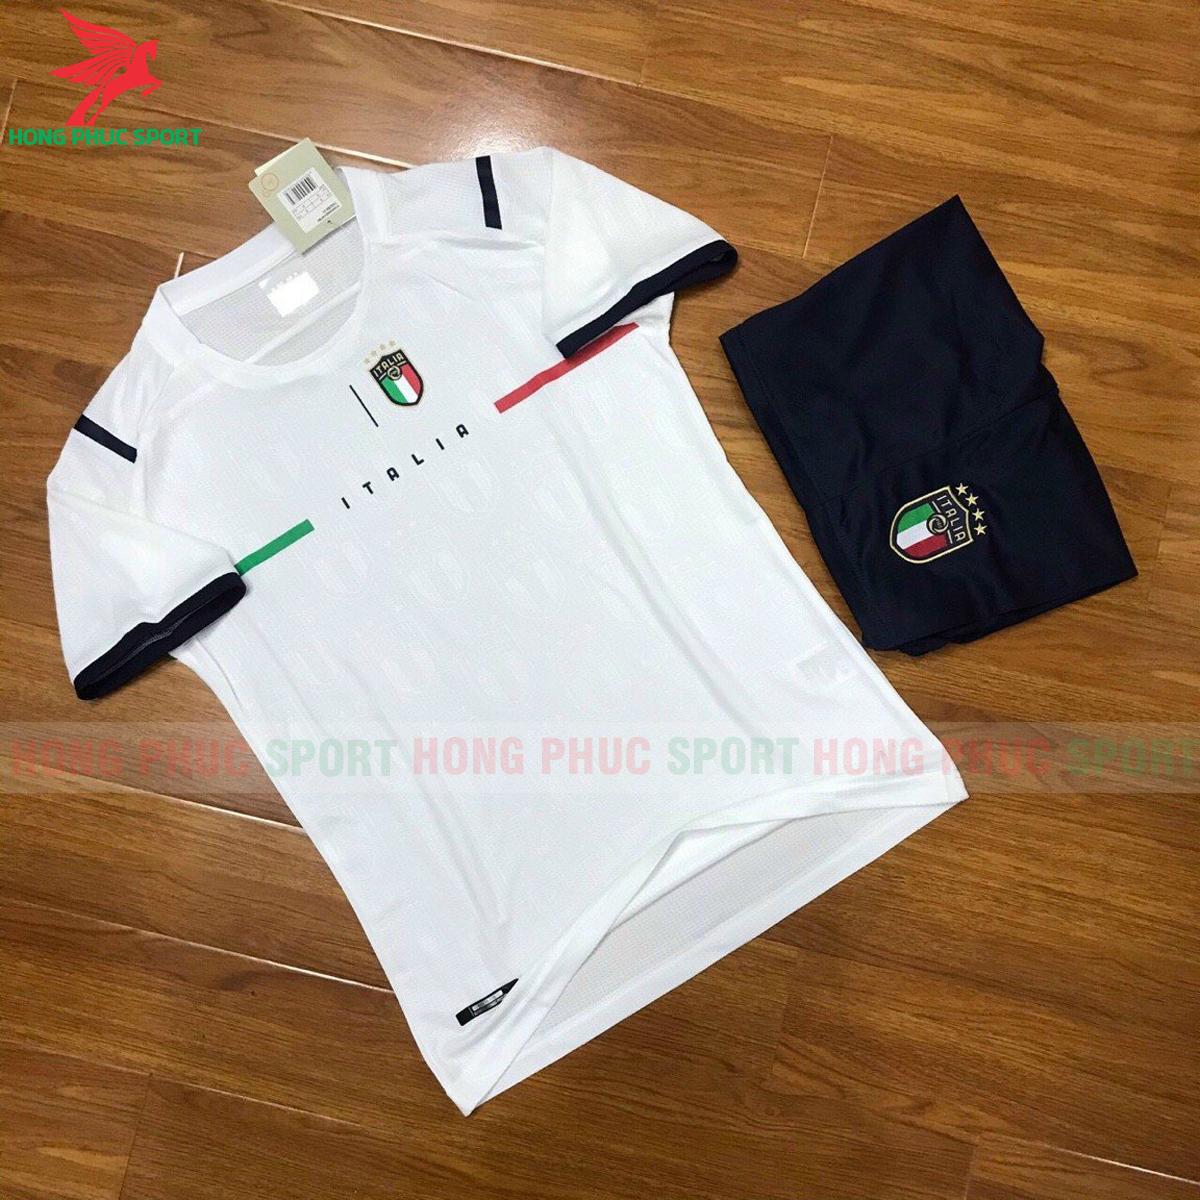 https://cdn.hongphucsport.com/unsafe/s4.shopbay.vn/files/285/ao-tuyen-italia-2021-2022-san-khach-1-60bf4c371e909.png